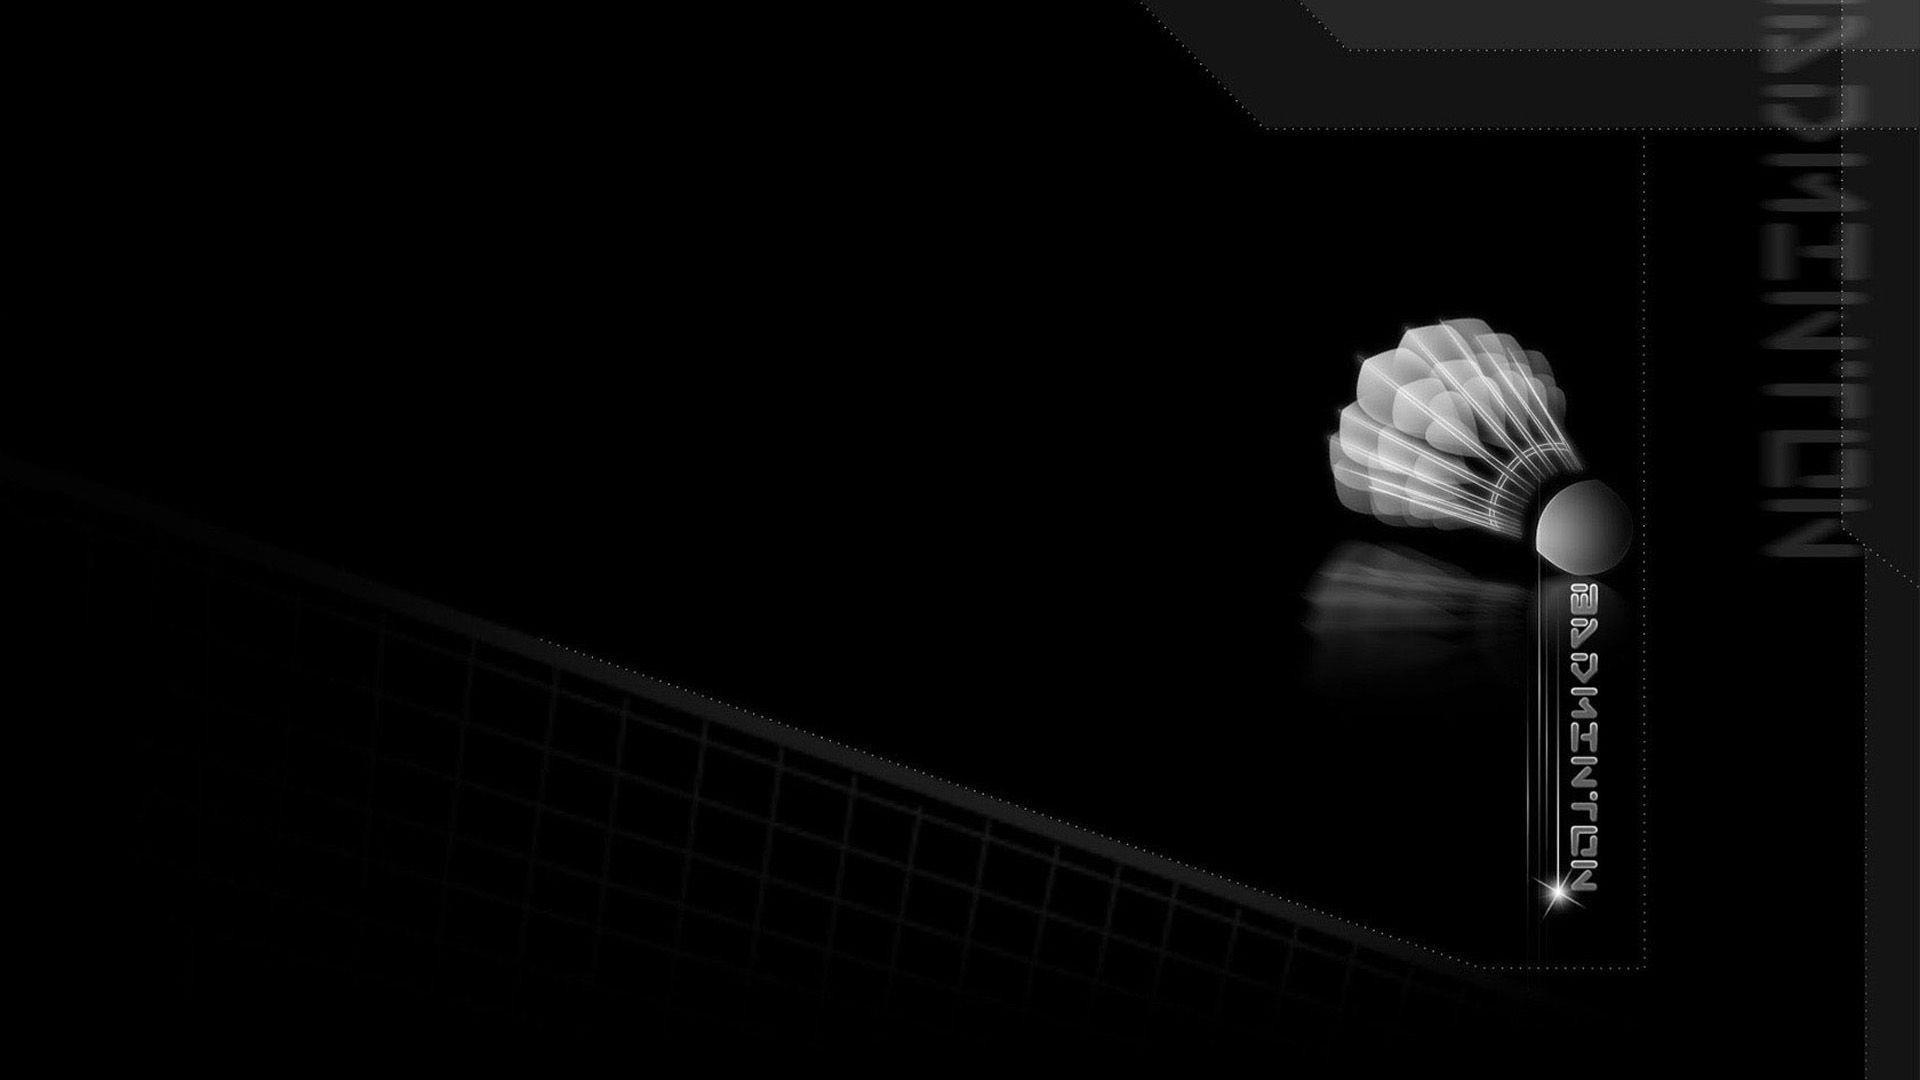 Badminton Pic